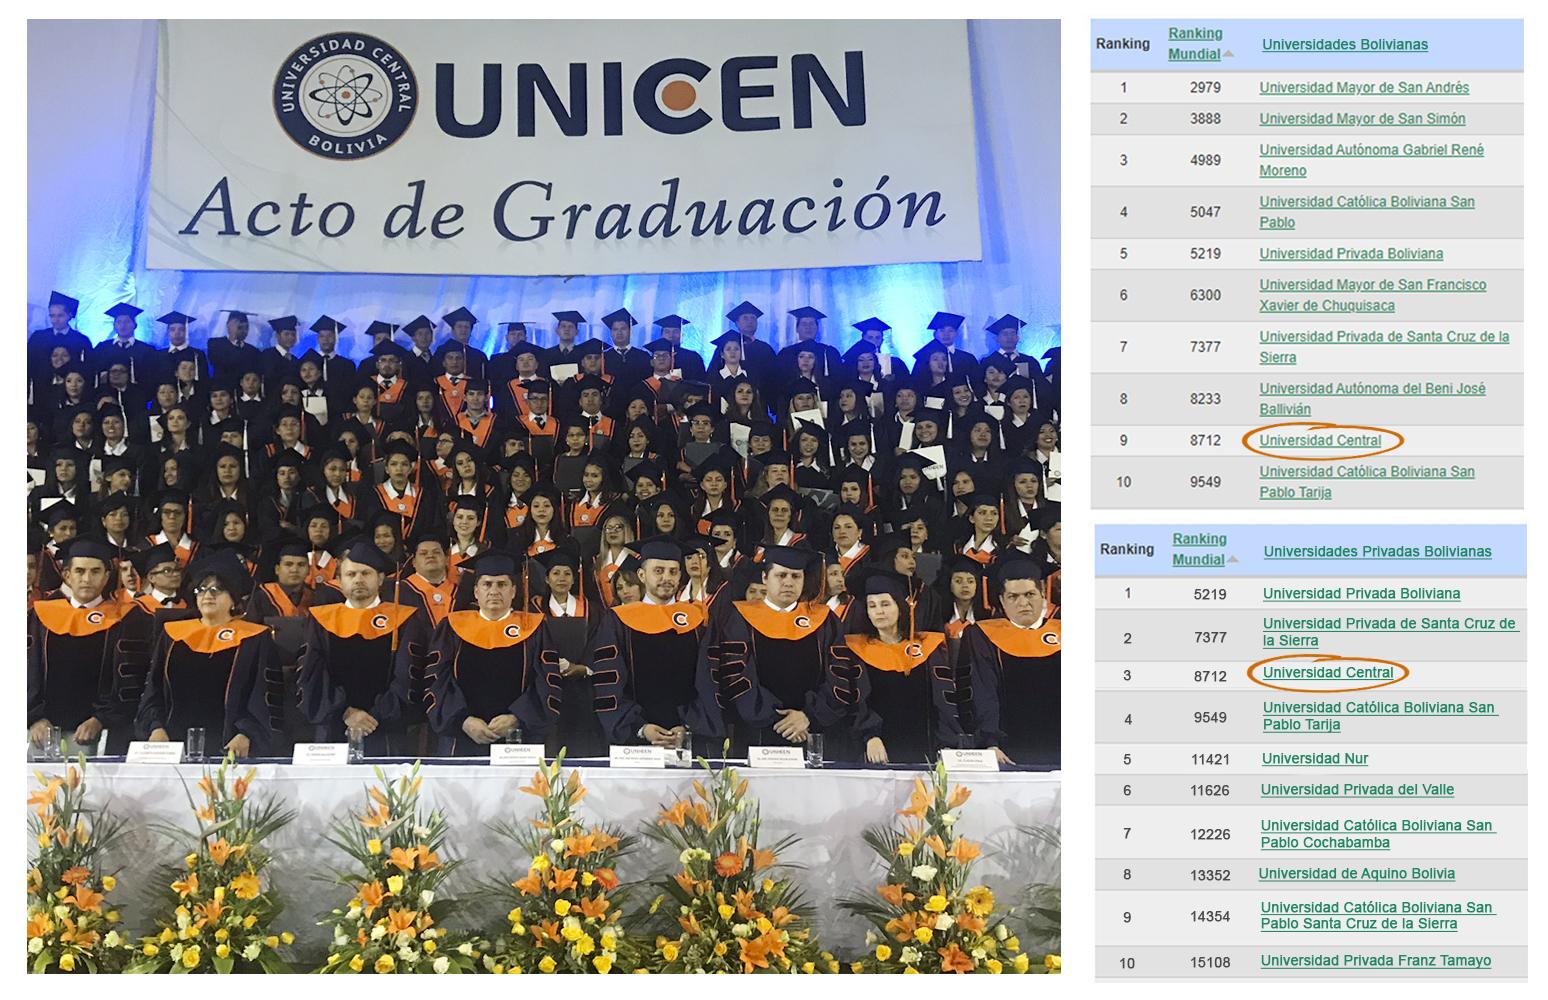 Unicen entre las 3 mejores universidades privadas de Bolivia